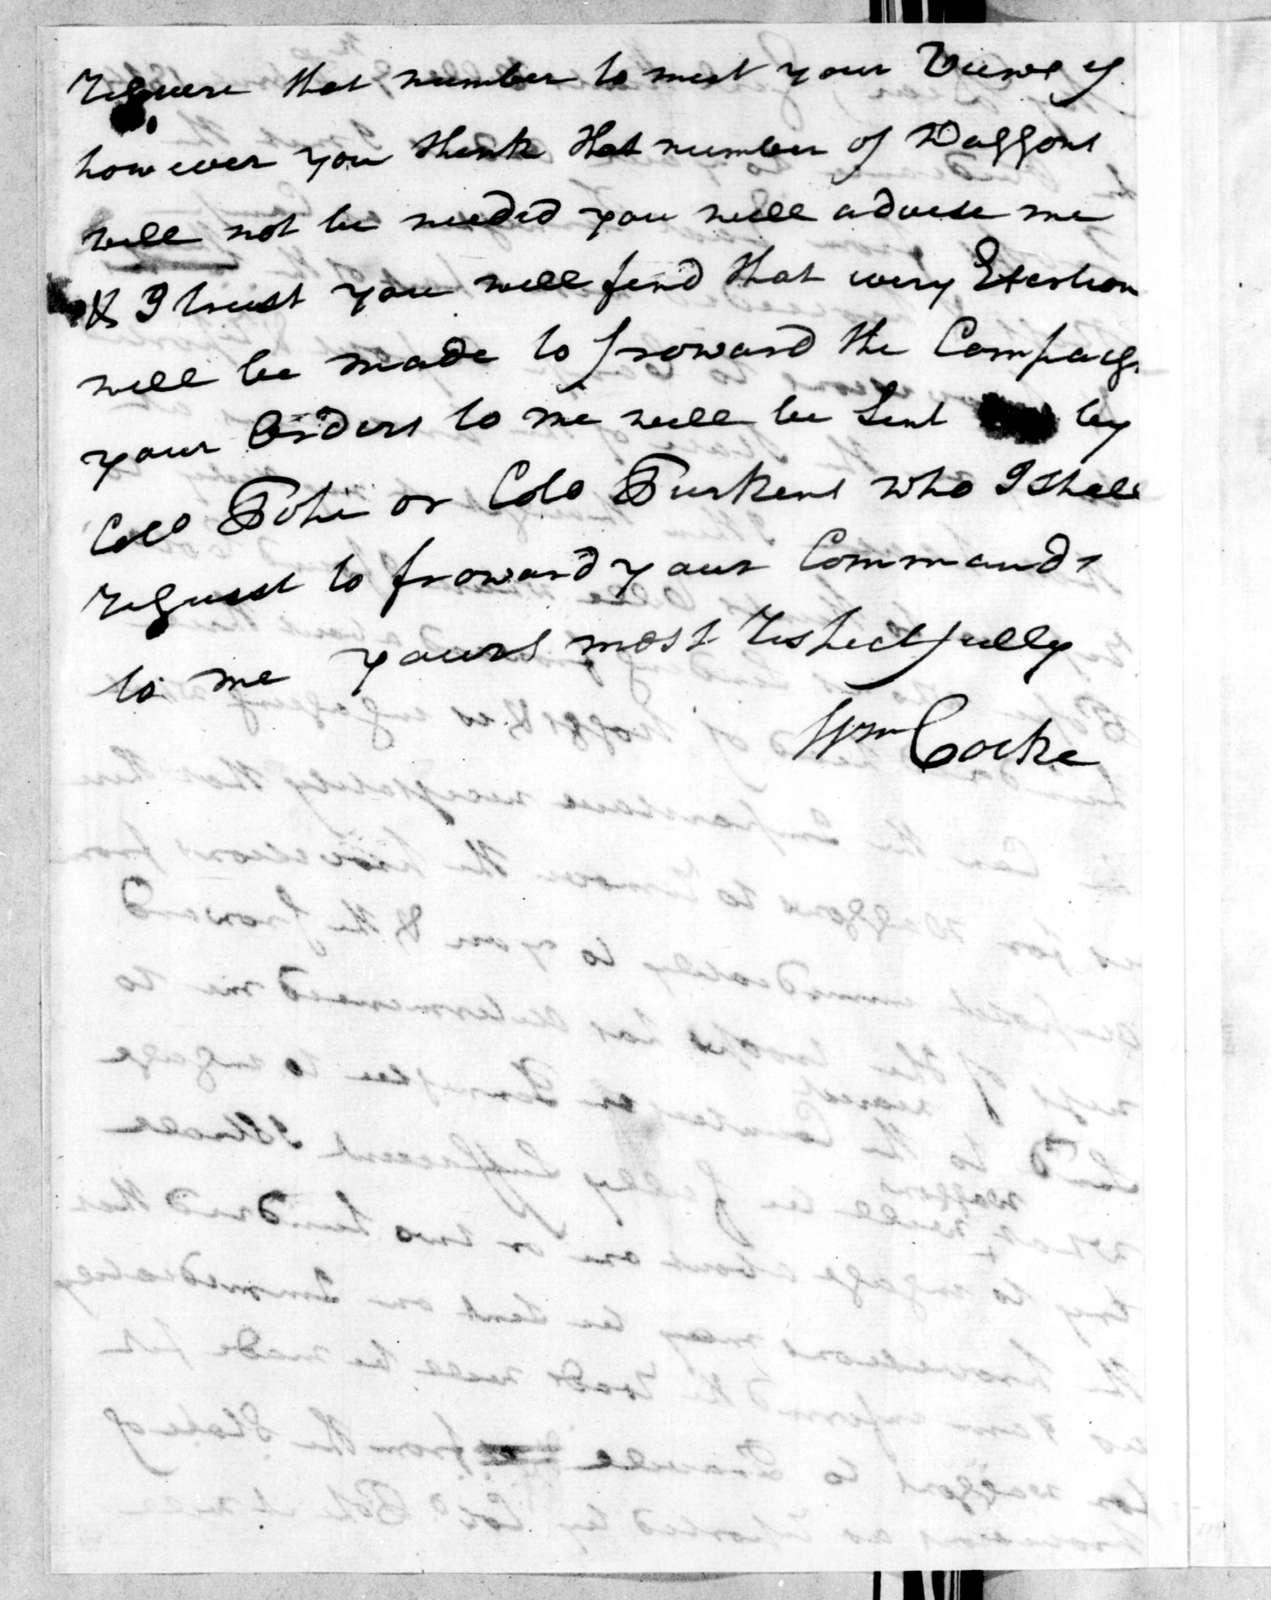 William Cocke to Andrew Jackson, February 9, 1814